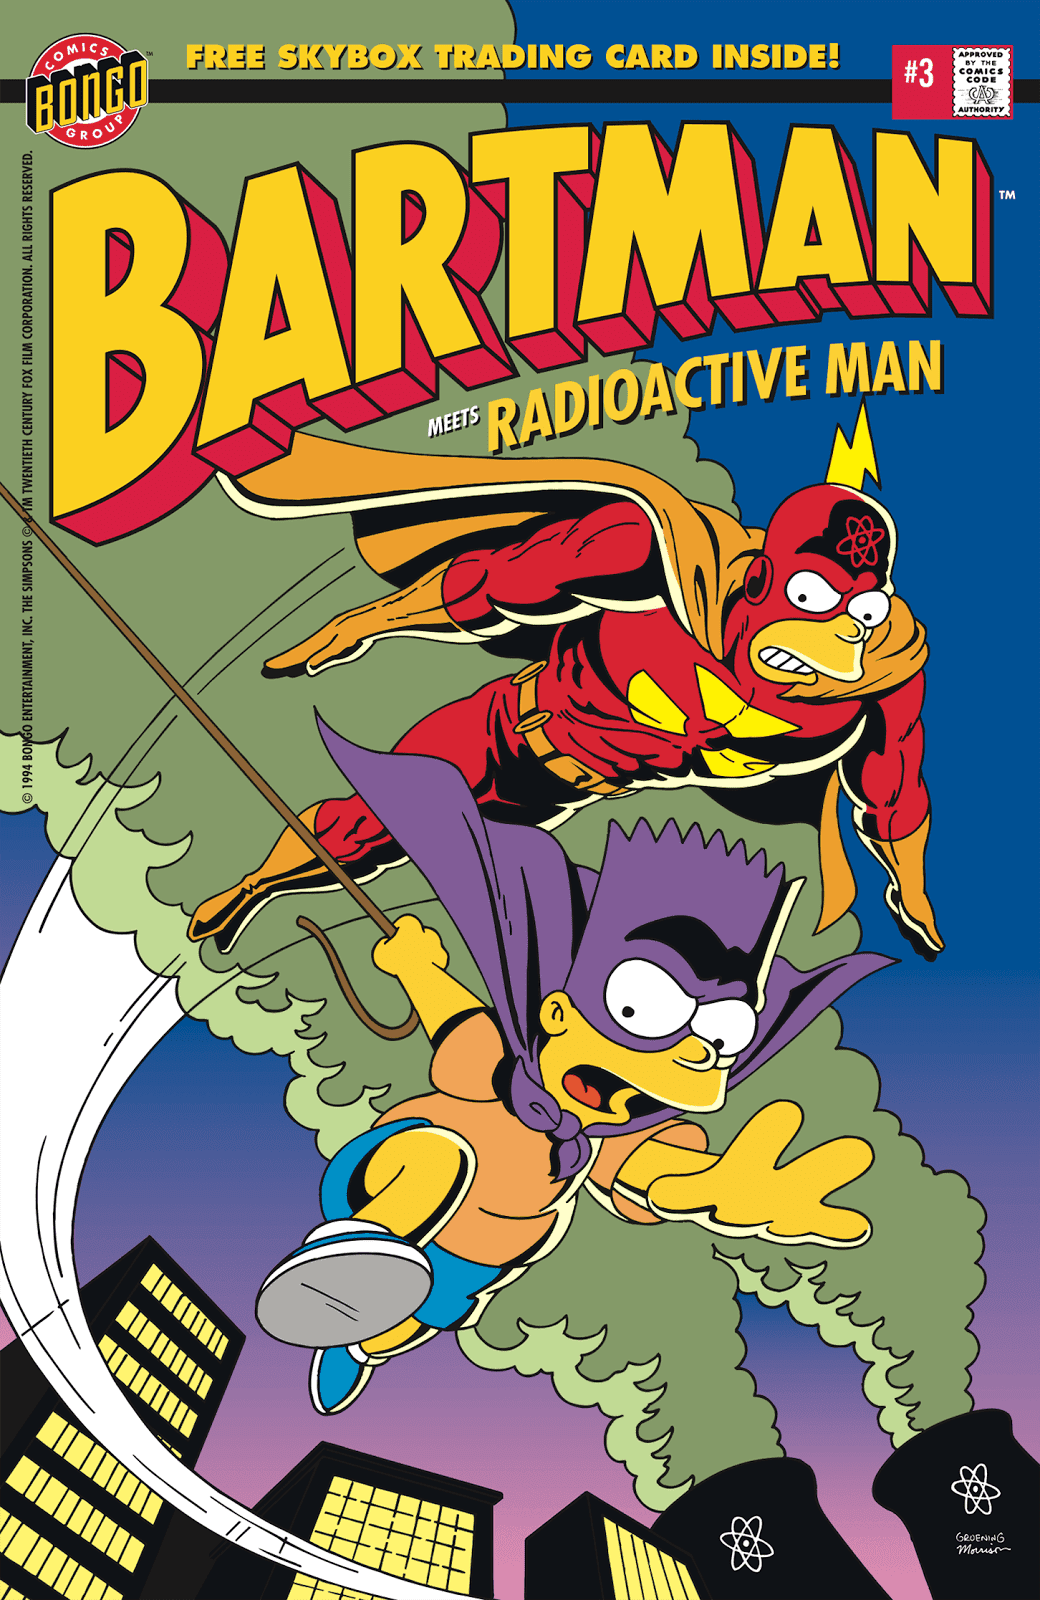 Read online Bartman comic -  Issue #3 - 1